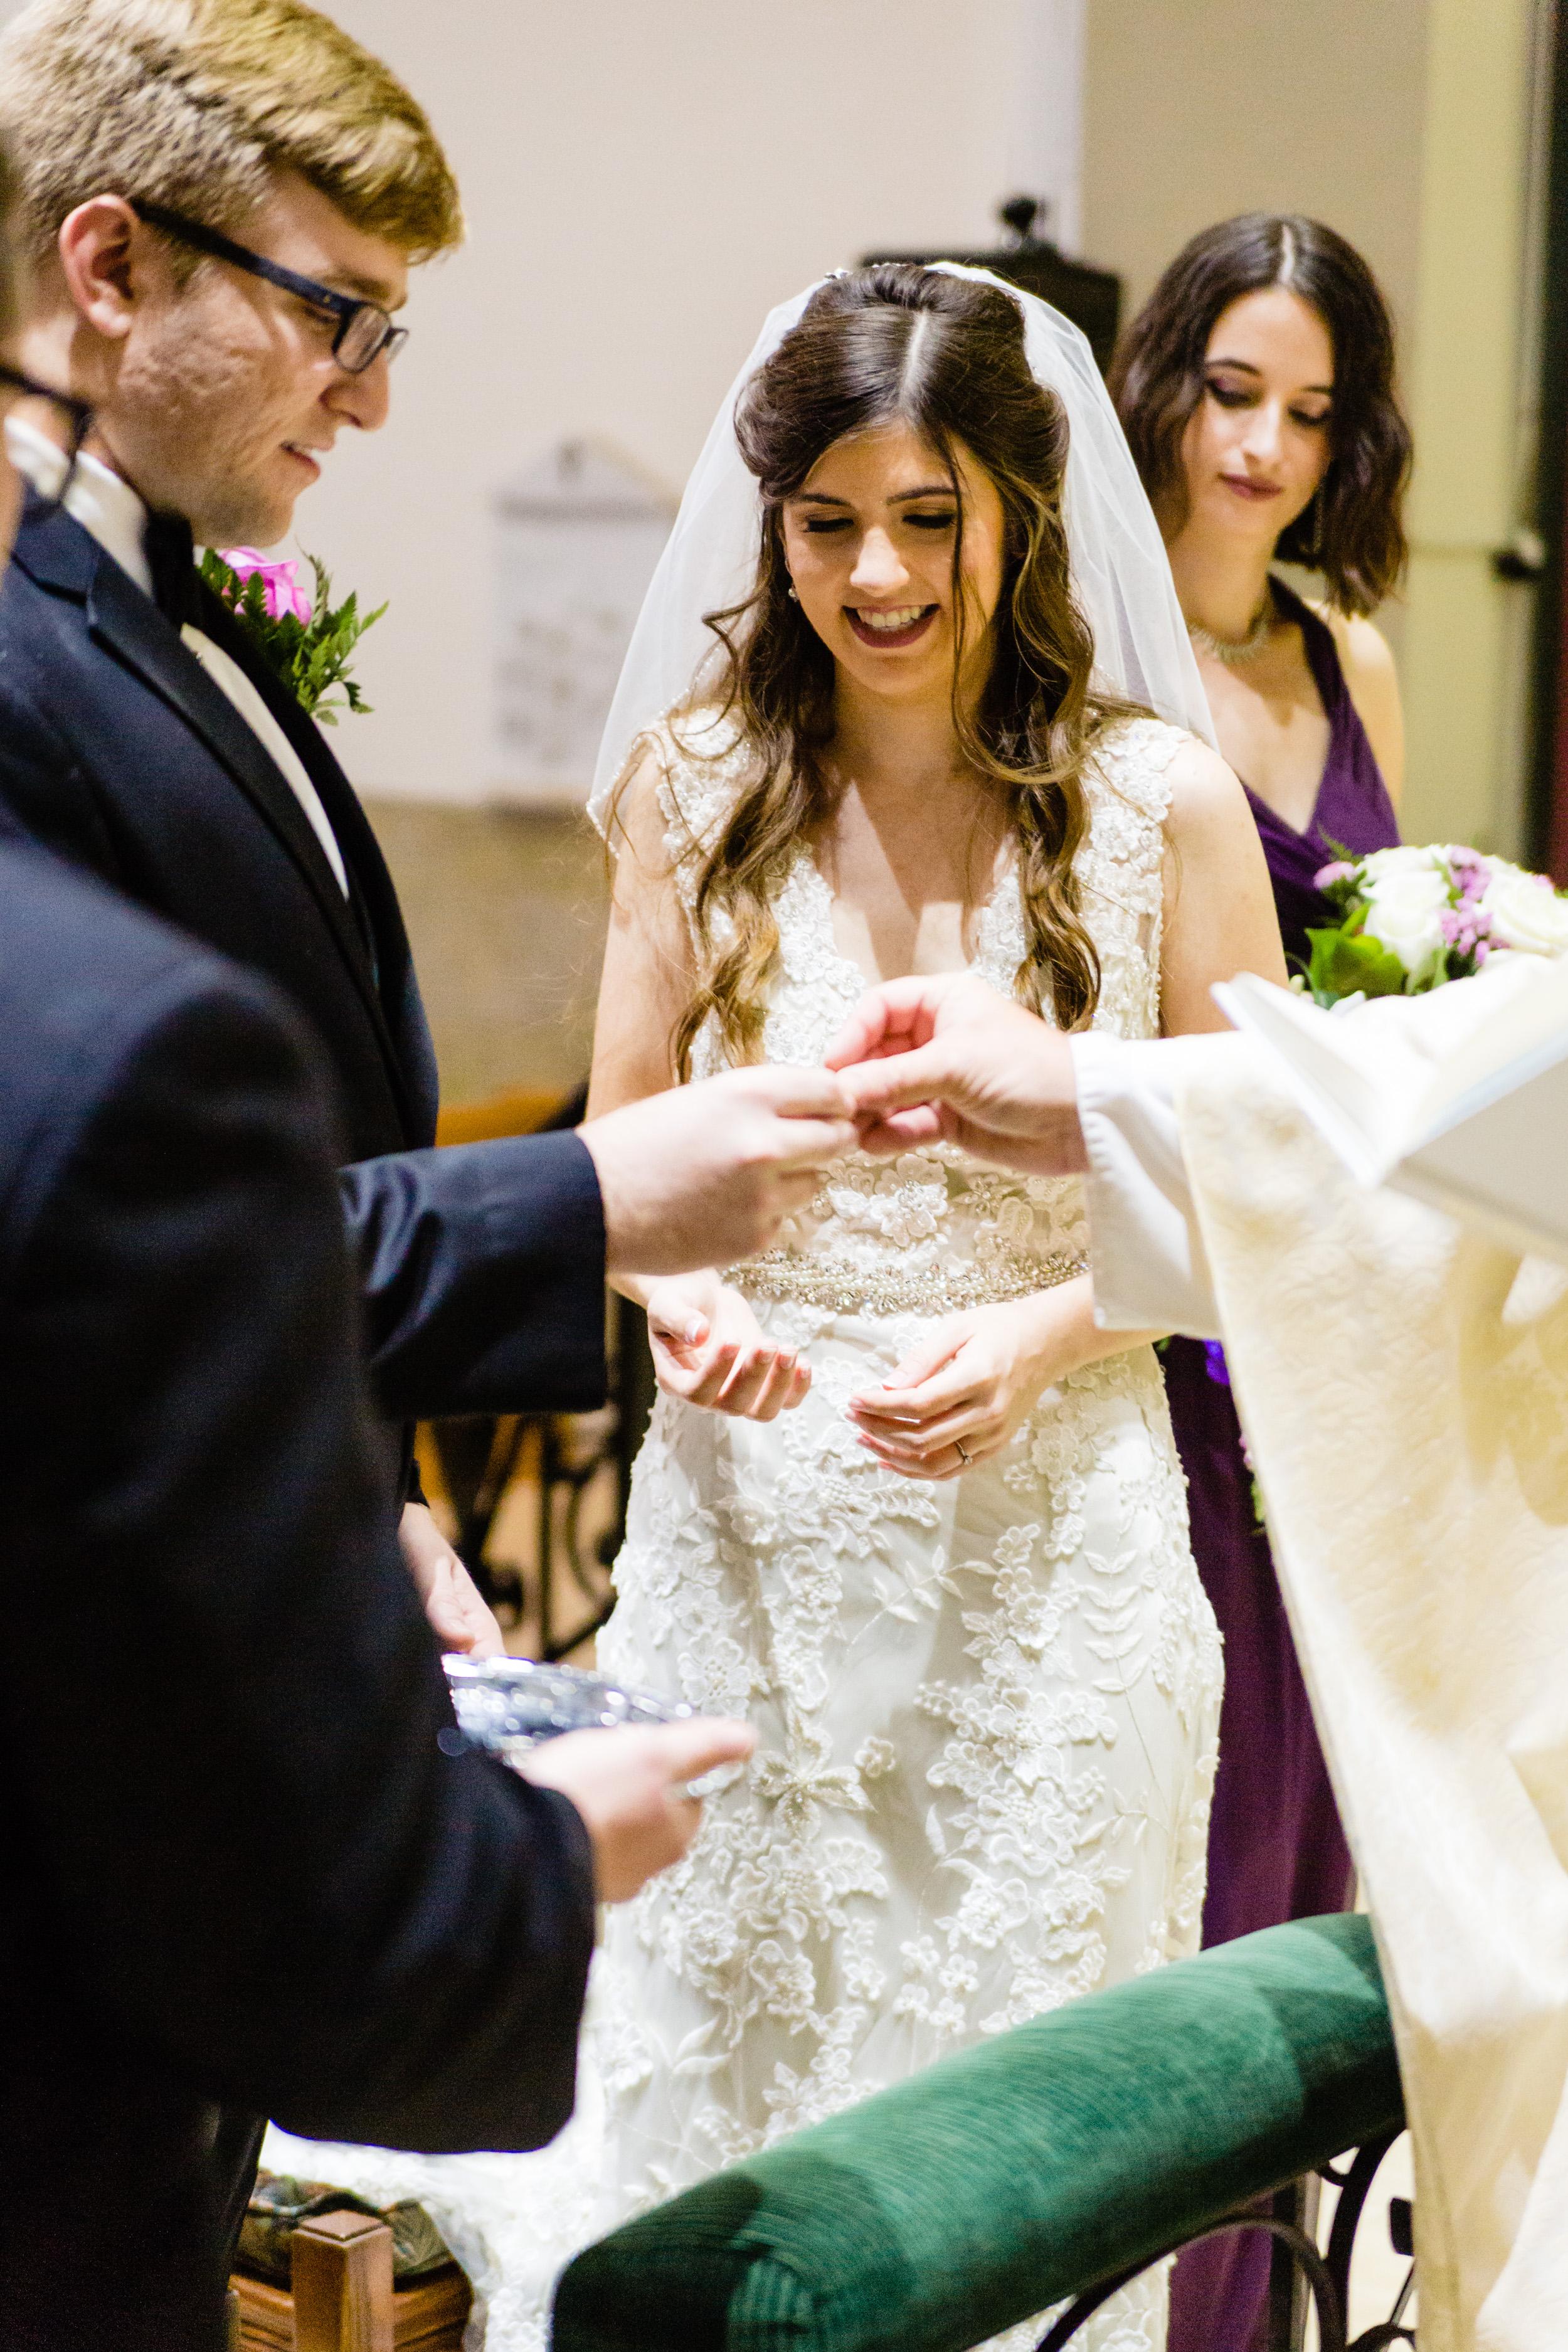 HAH_Zoe and Daniel_Clearwater Wedding_229_2018.jpg